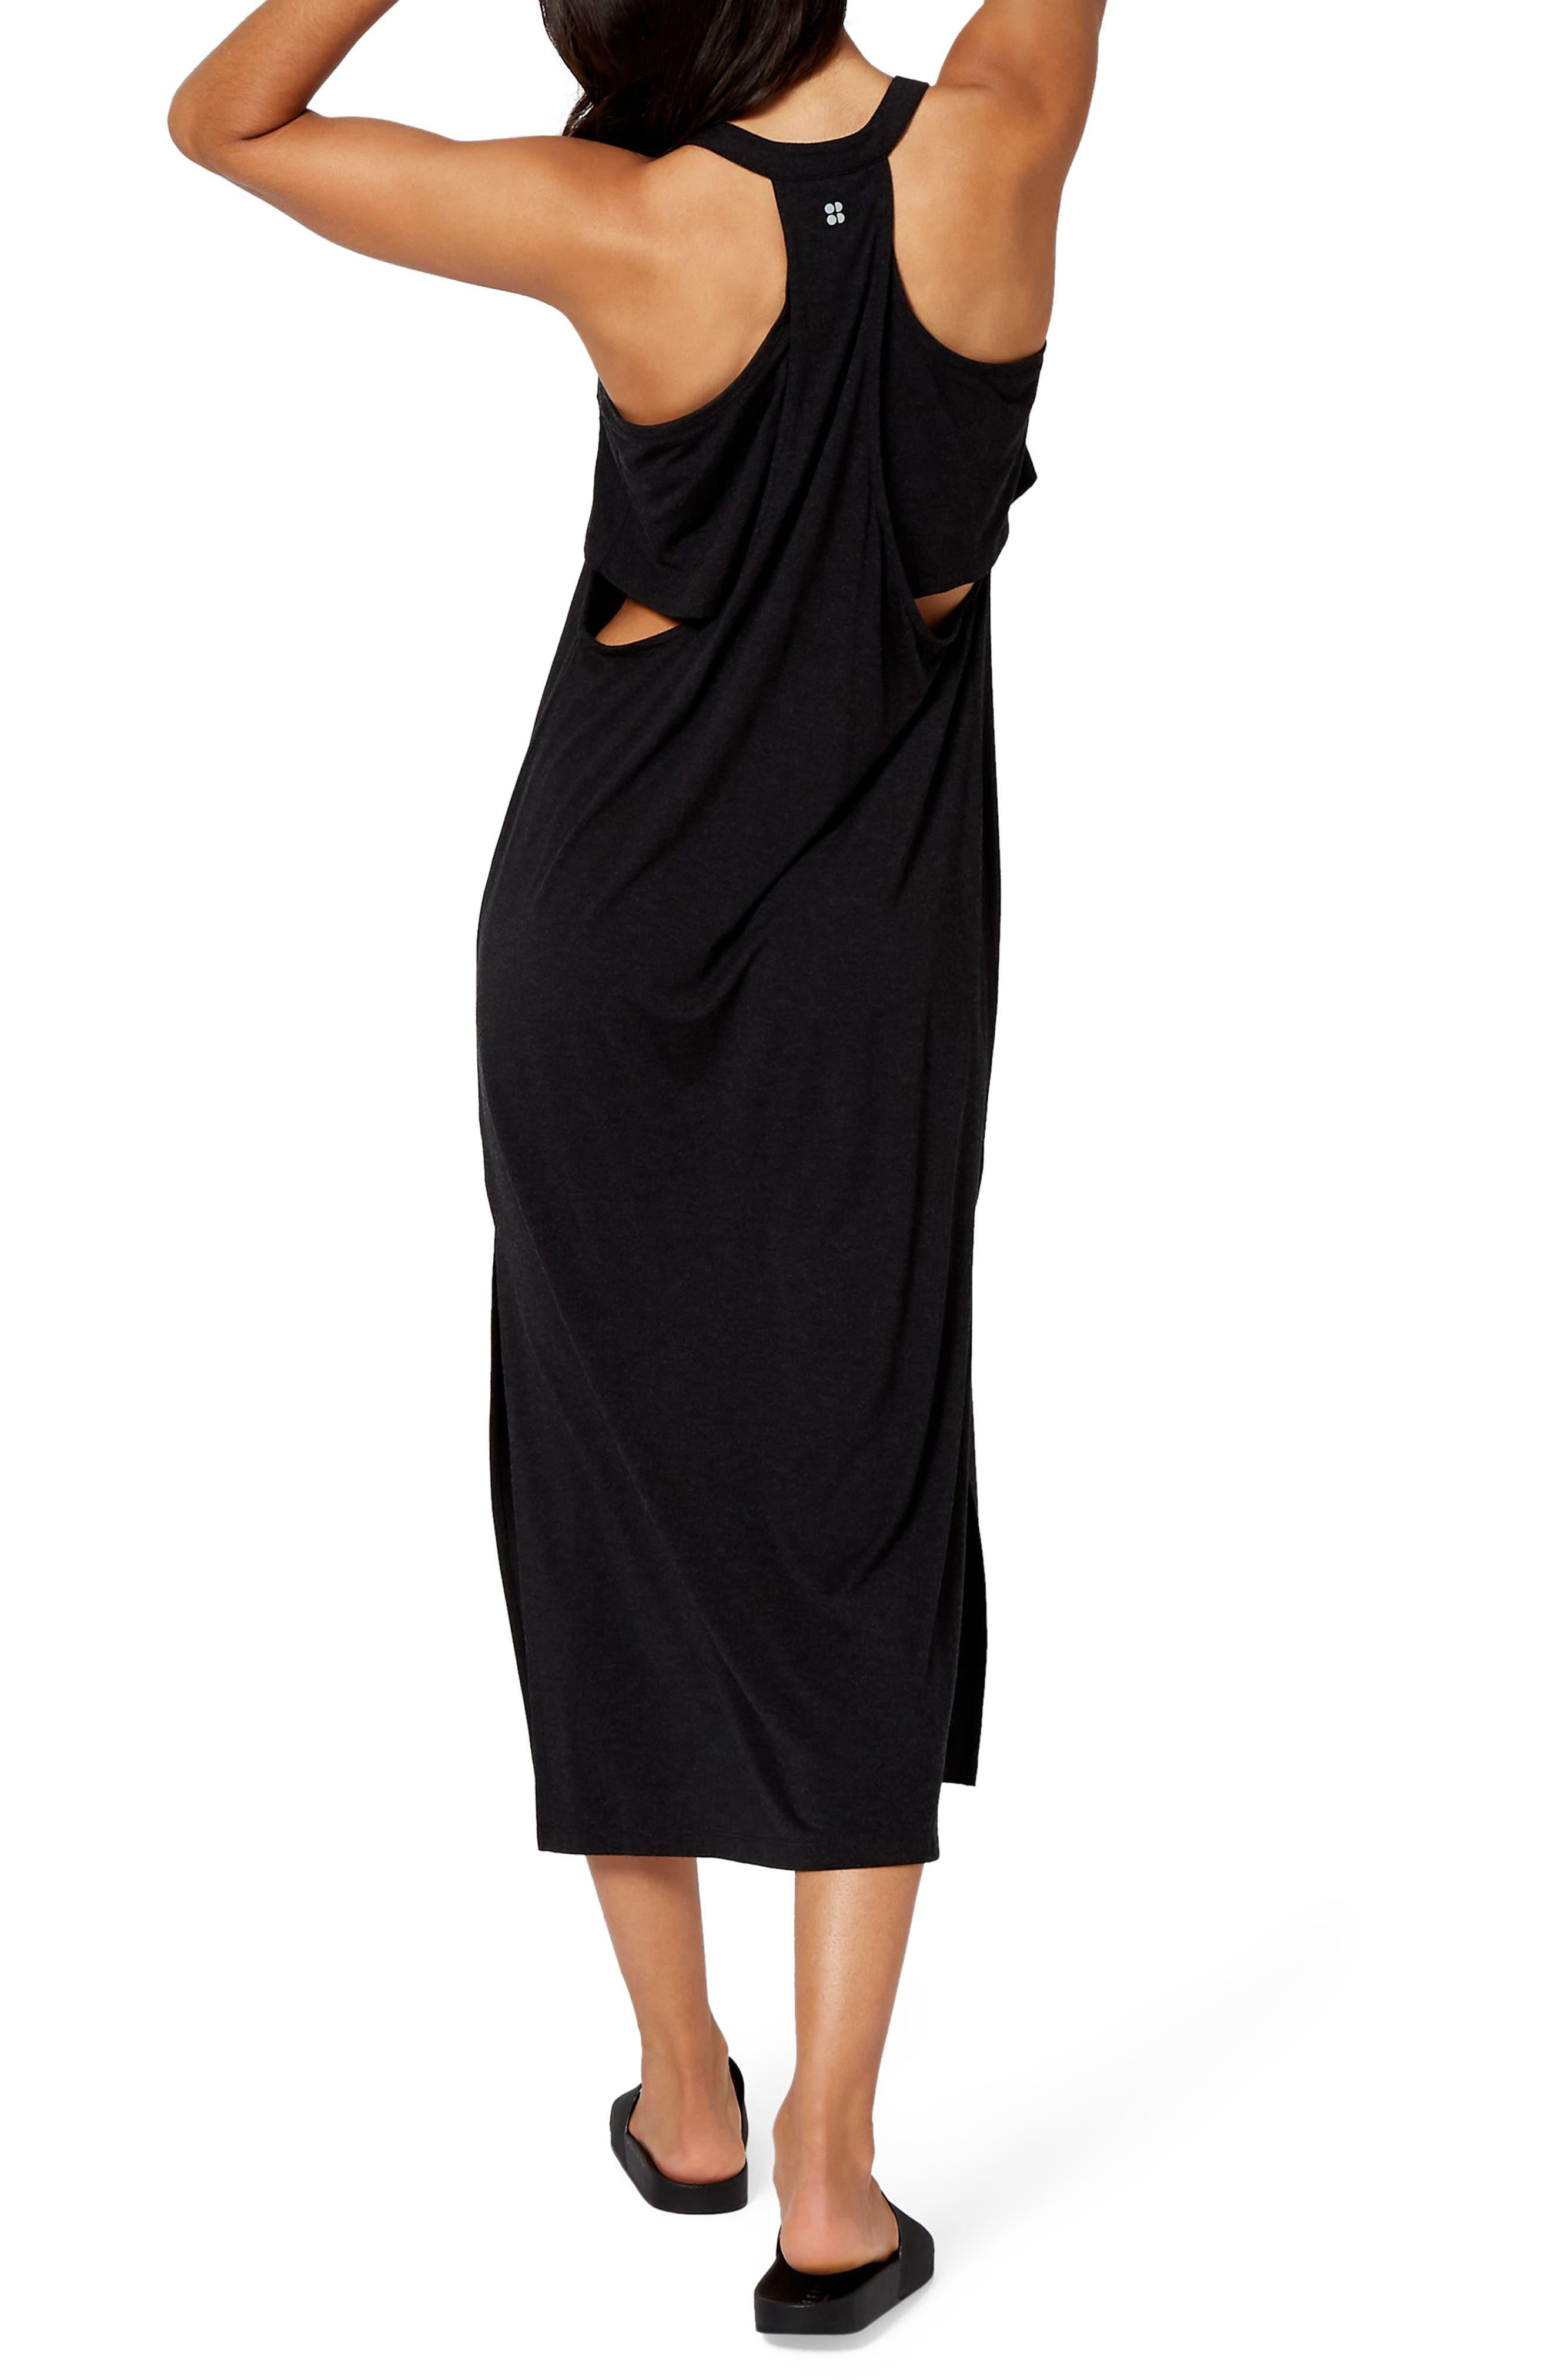 Holistic Dress,                             Alternate thumbnail 2, color,                             BLACK MARL